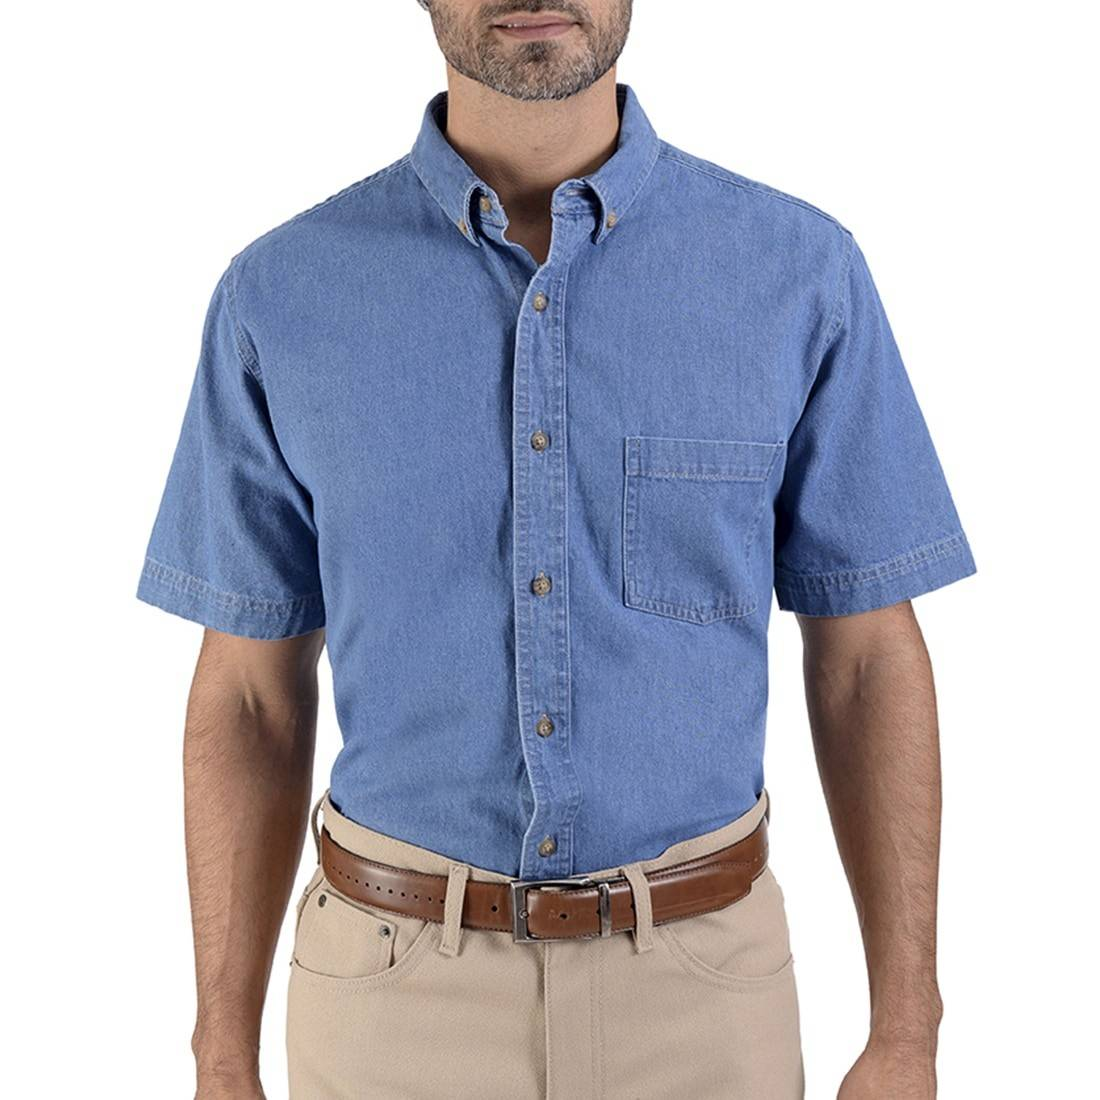 042368351614-01-Camisa-Mezclilla-Manga-Corta-Classic-Fit-Stone-Bleach-yale